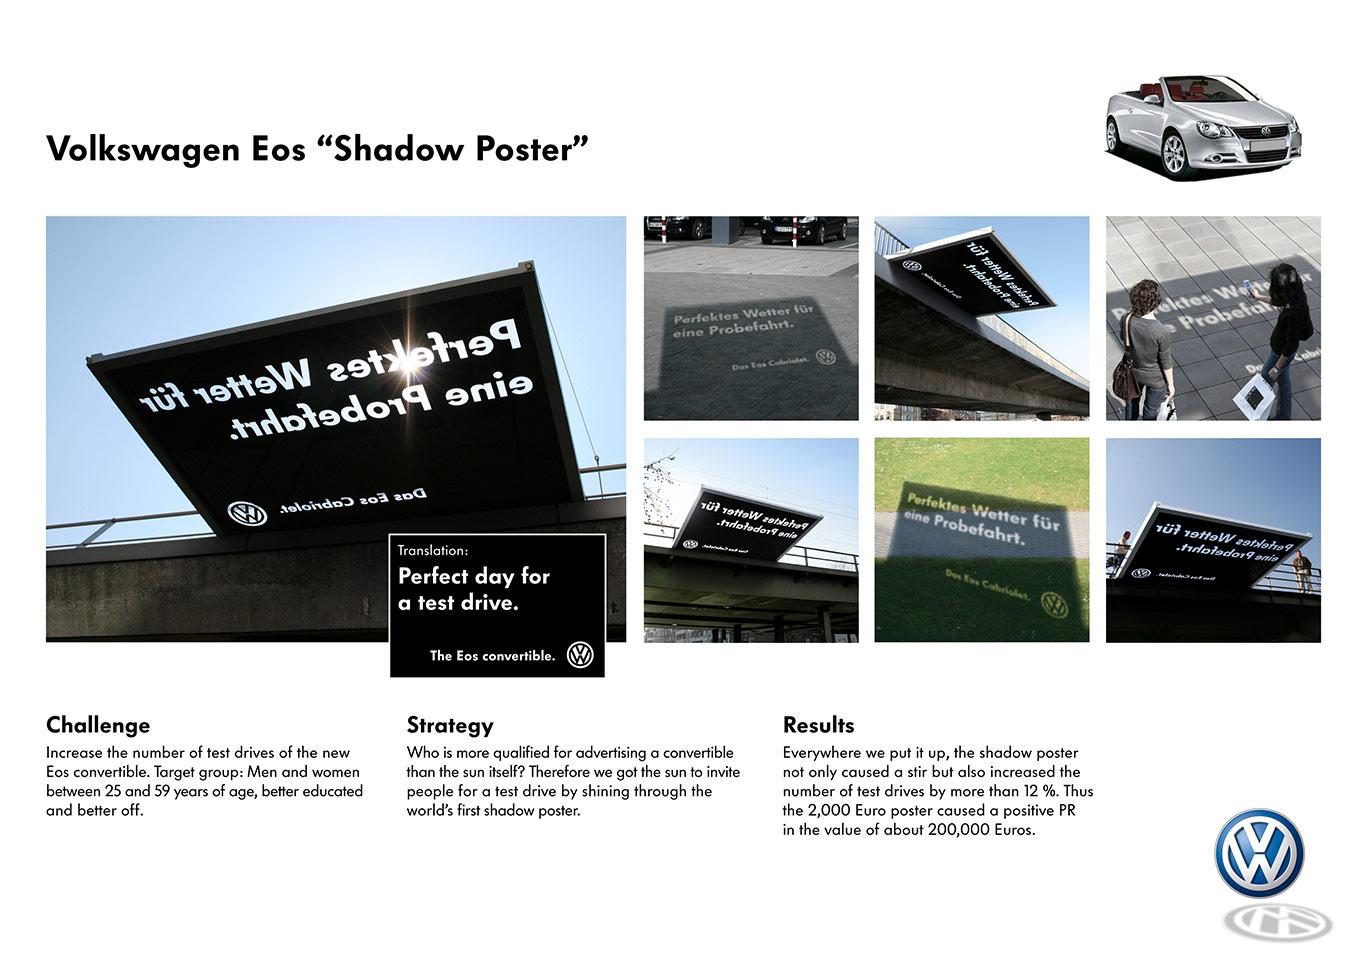 2-Volkswagen-Eos-Shadow-Poster-Board